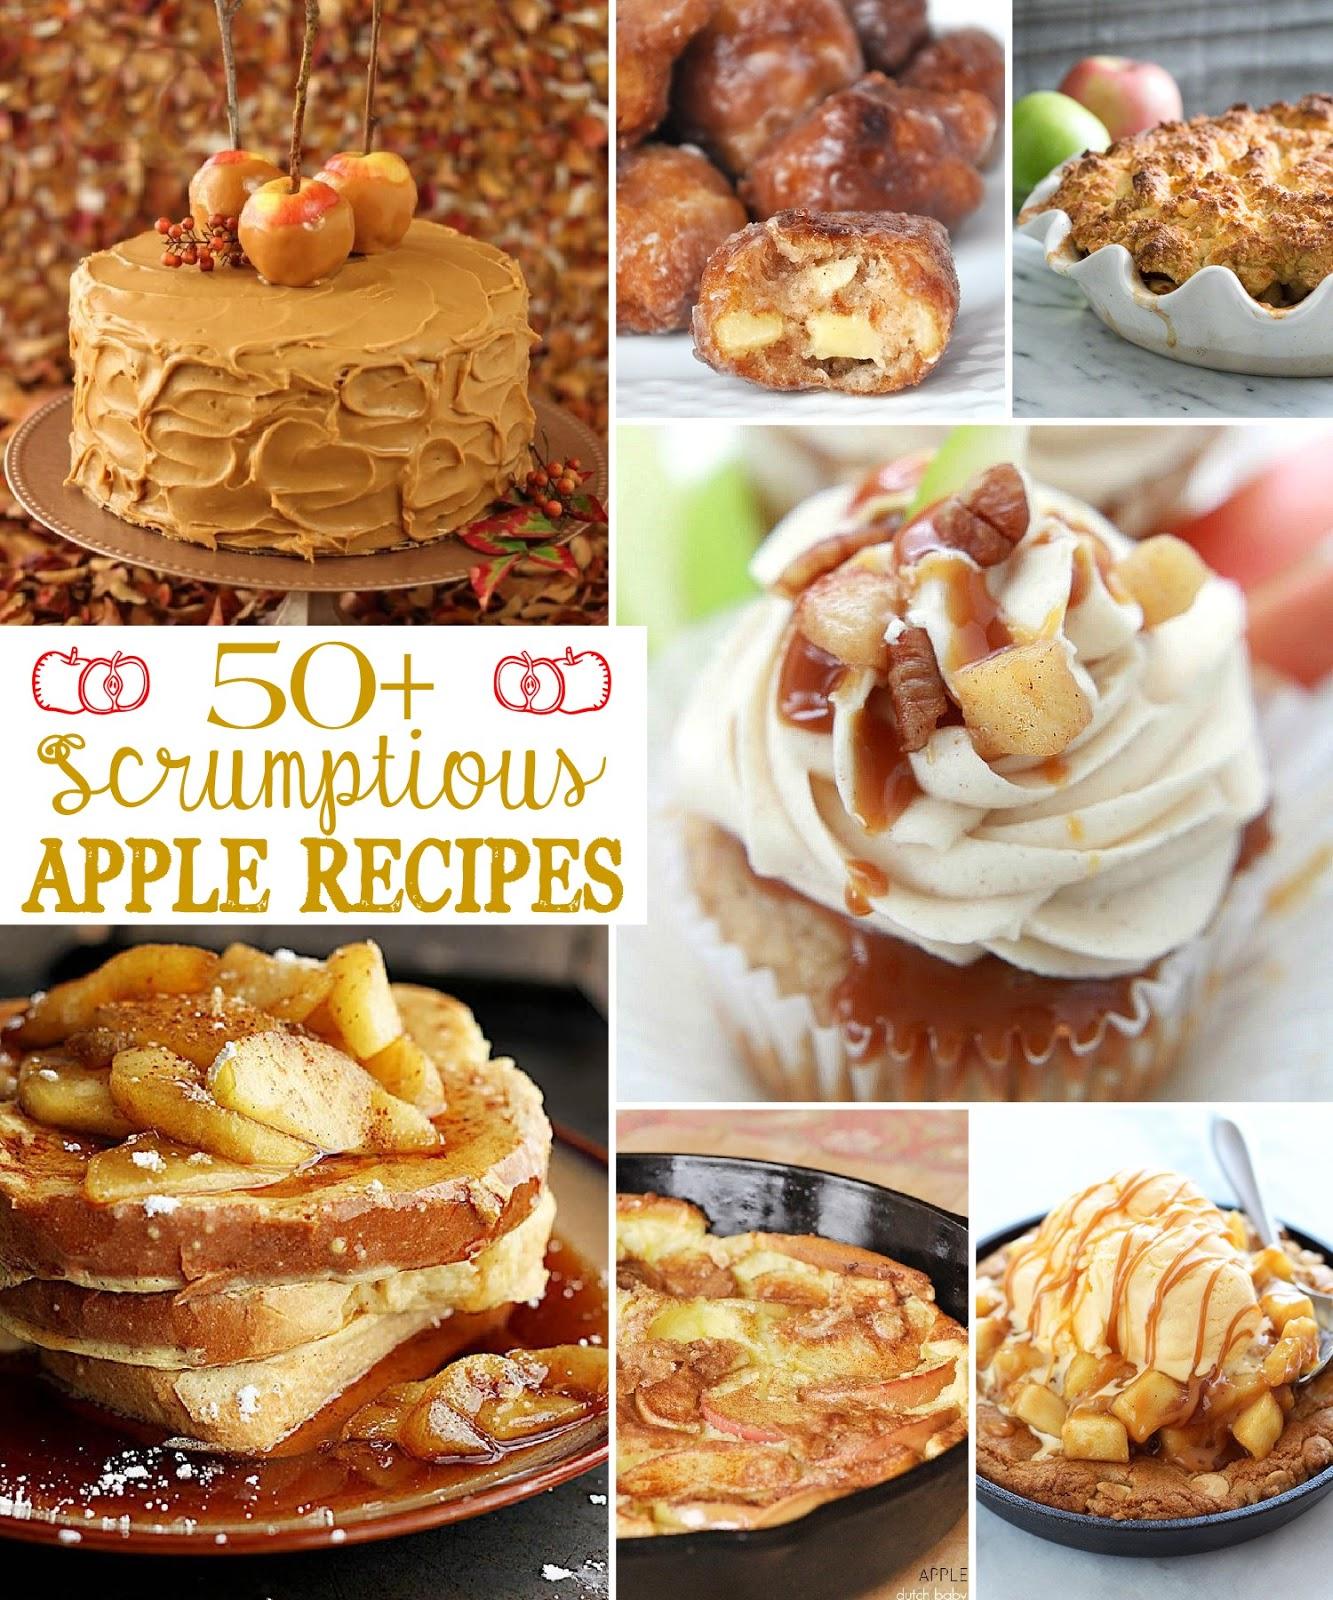 scrumptious apple recipes